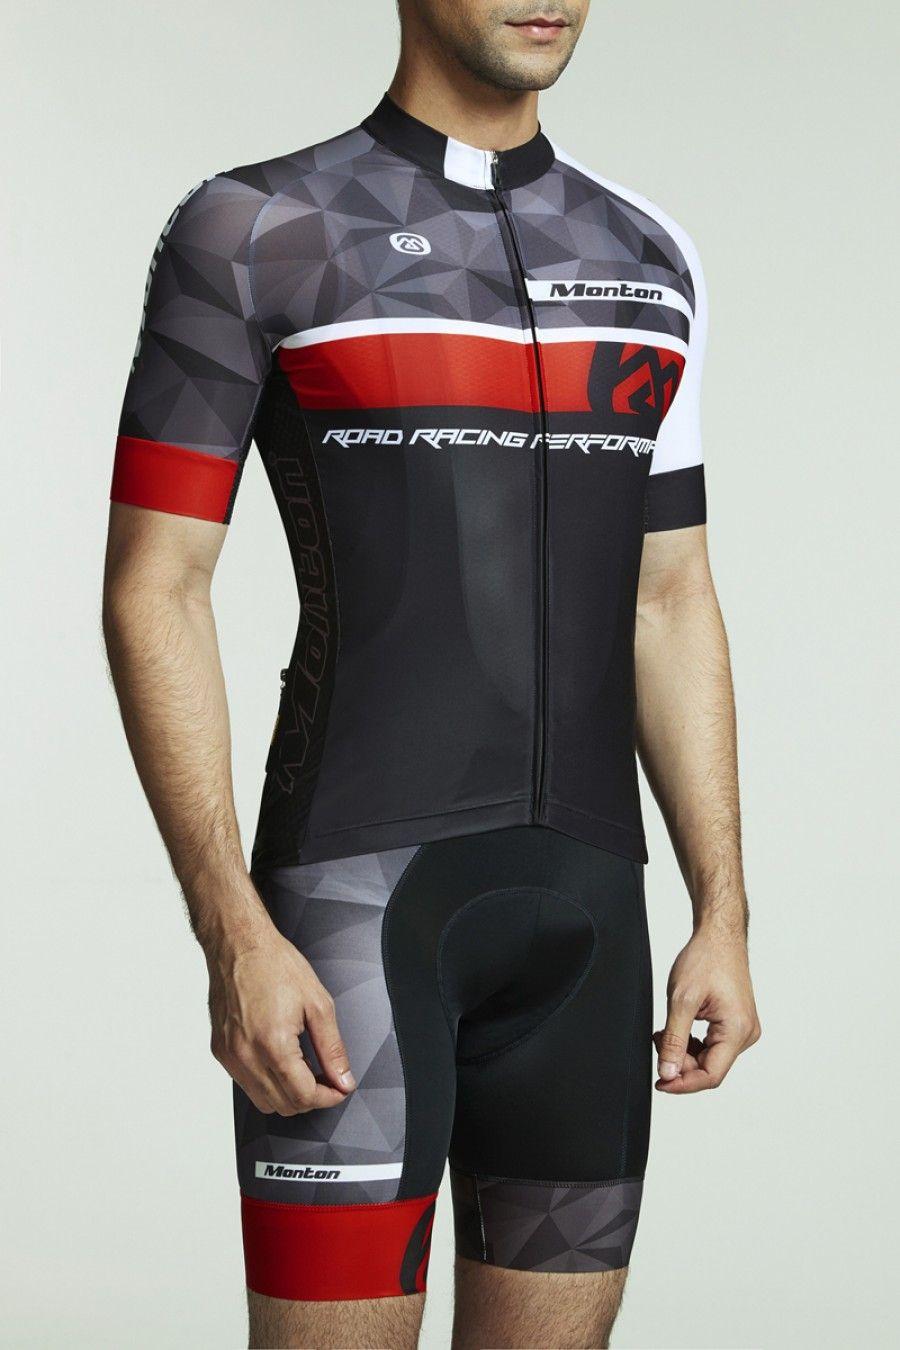 daf284d09 Cycling jersey set